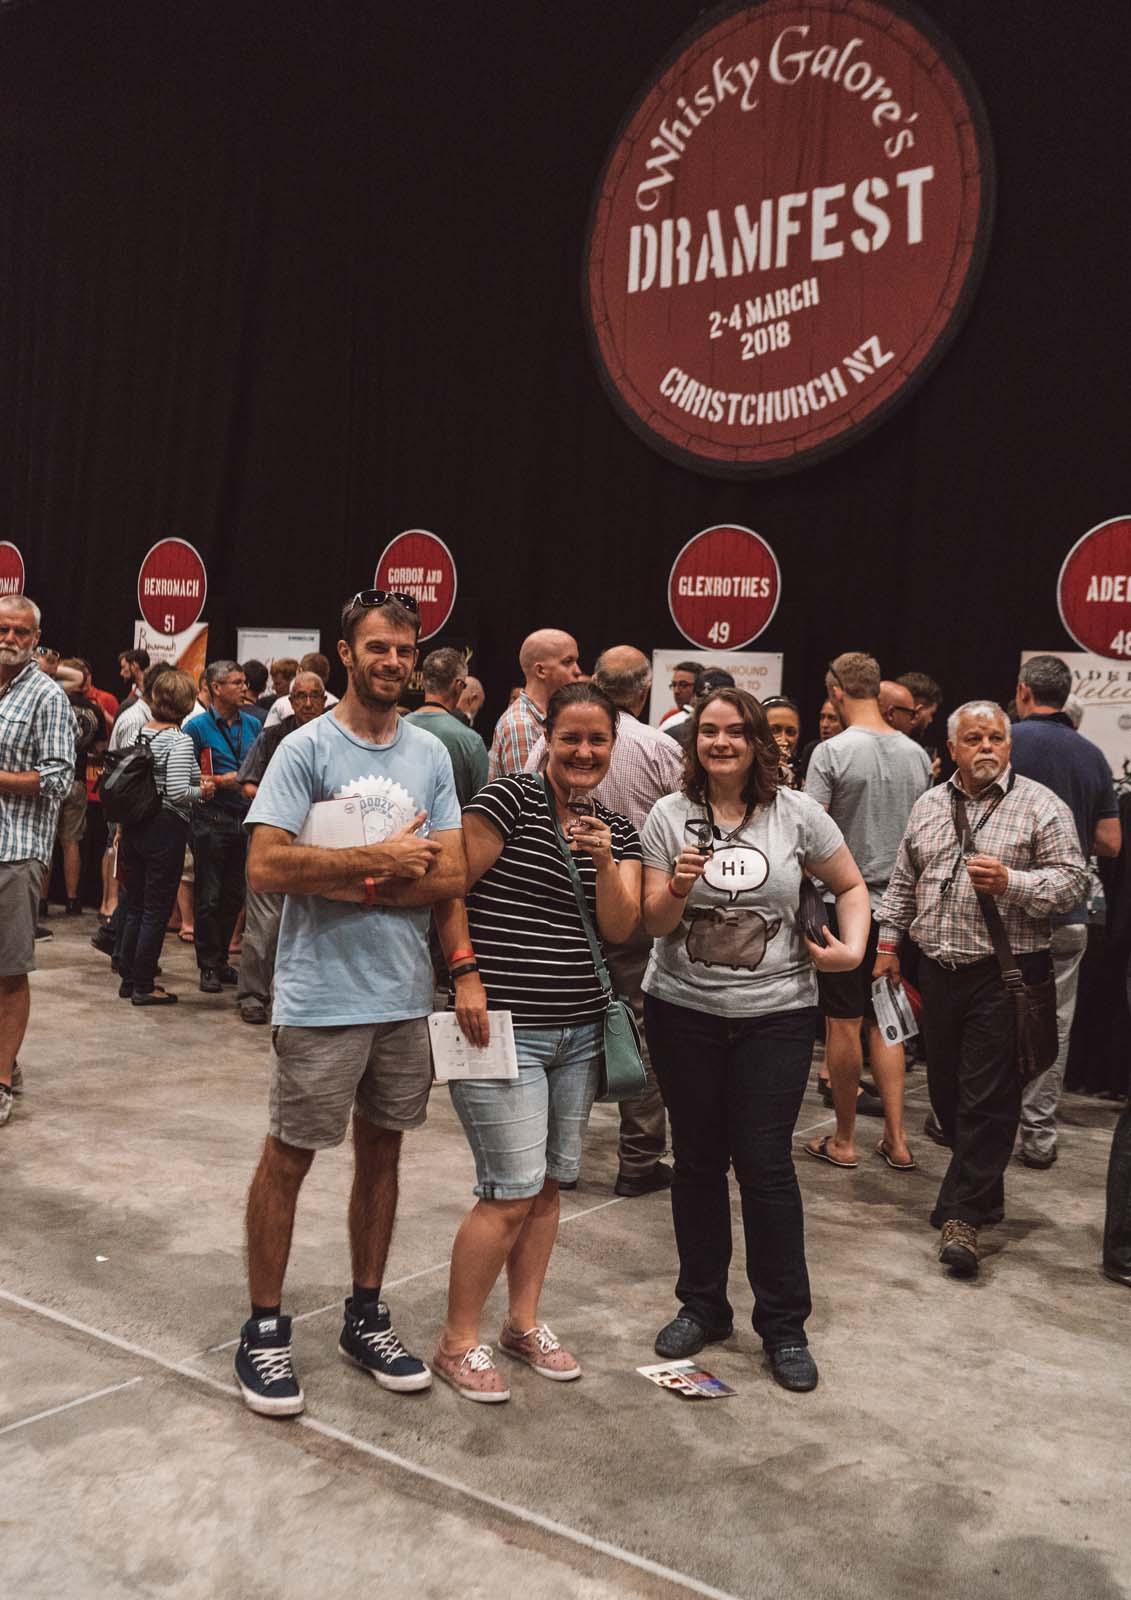 Dramfest 2018 for Whisky Galore-338.jpg